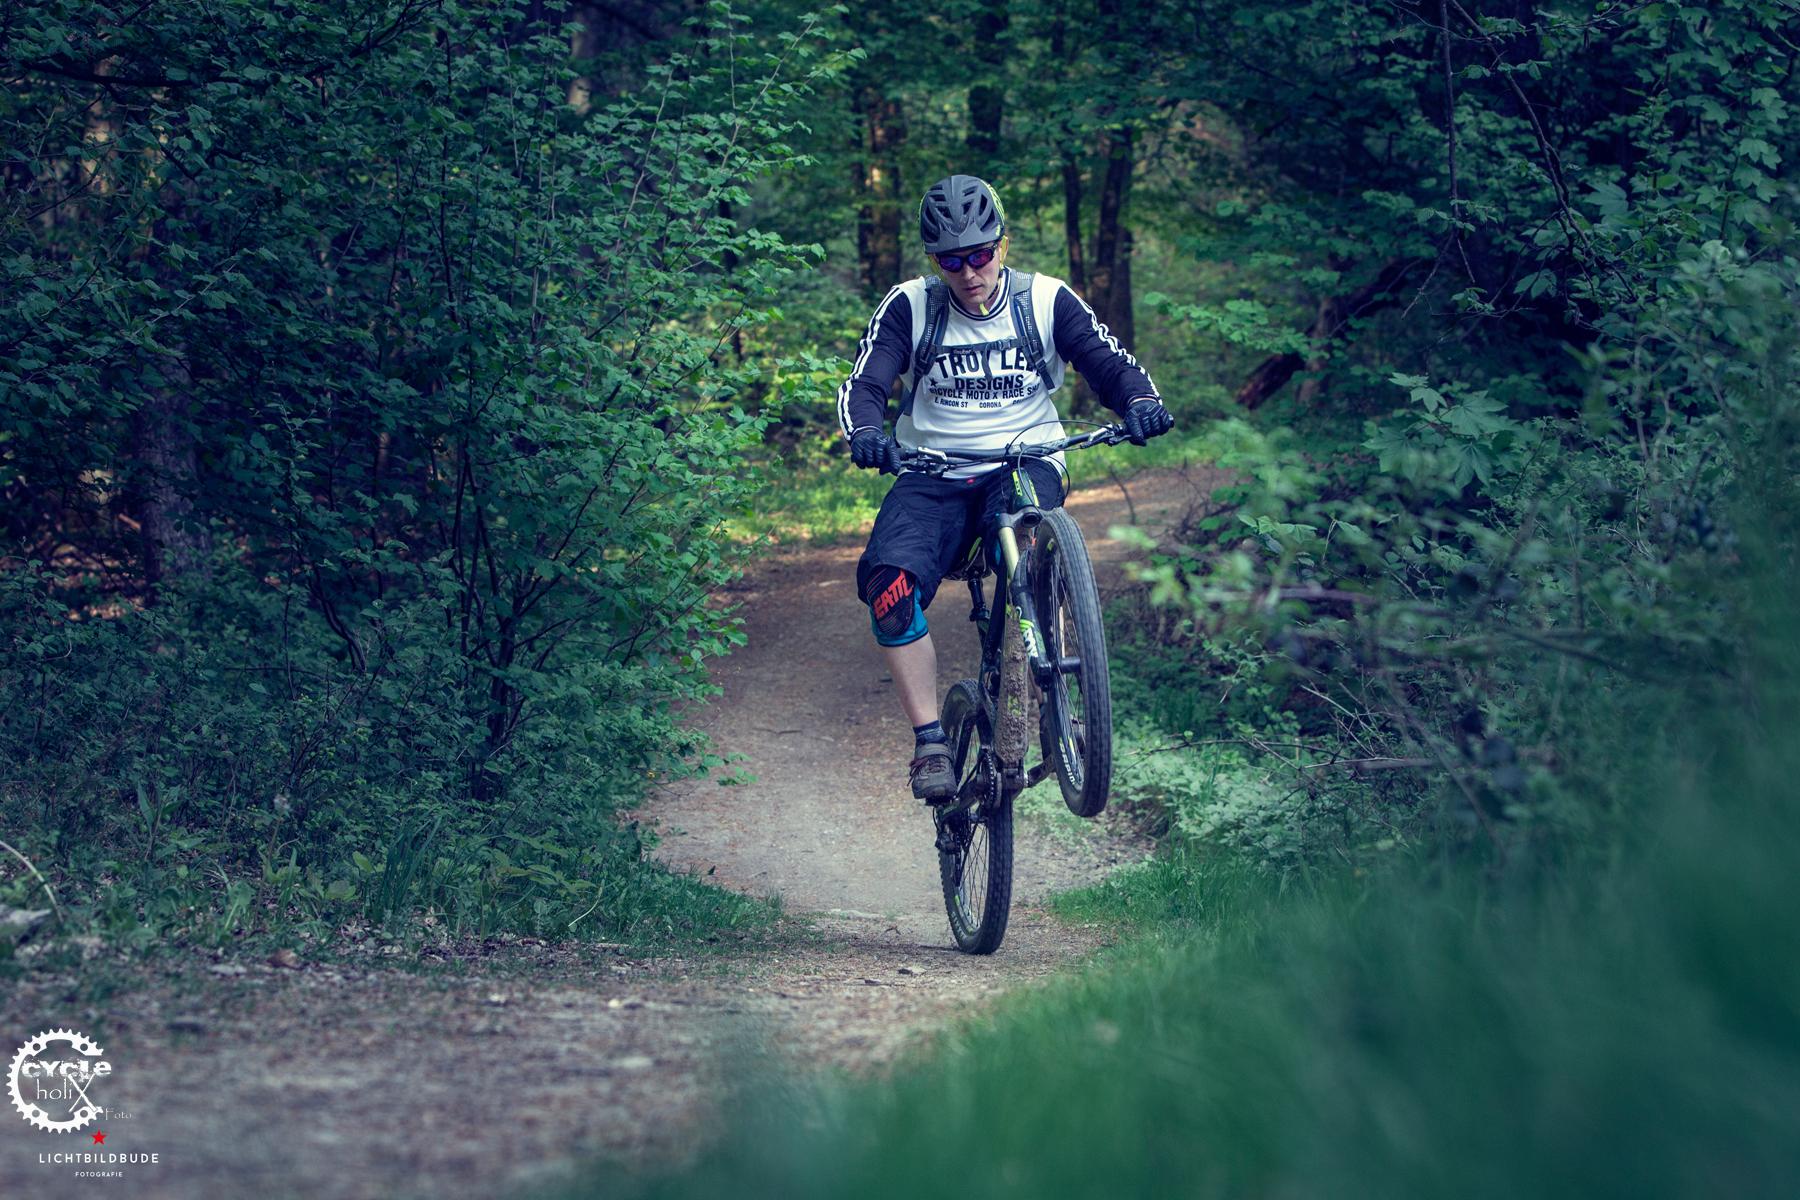 Test Leatt Elbow Und Knee Guard 3df Cycleholix Protecor